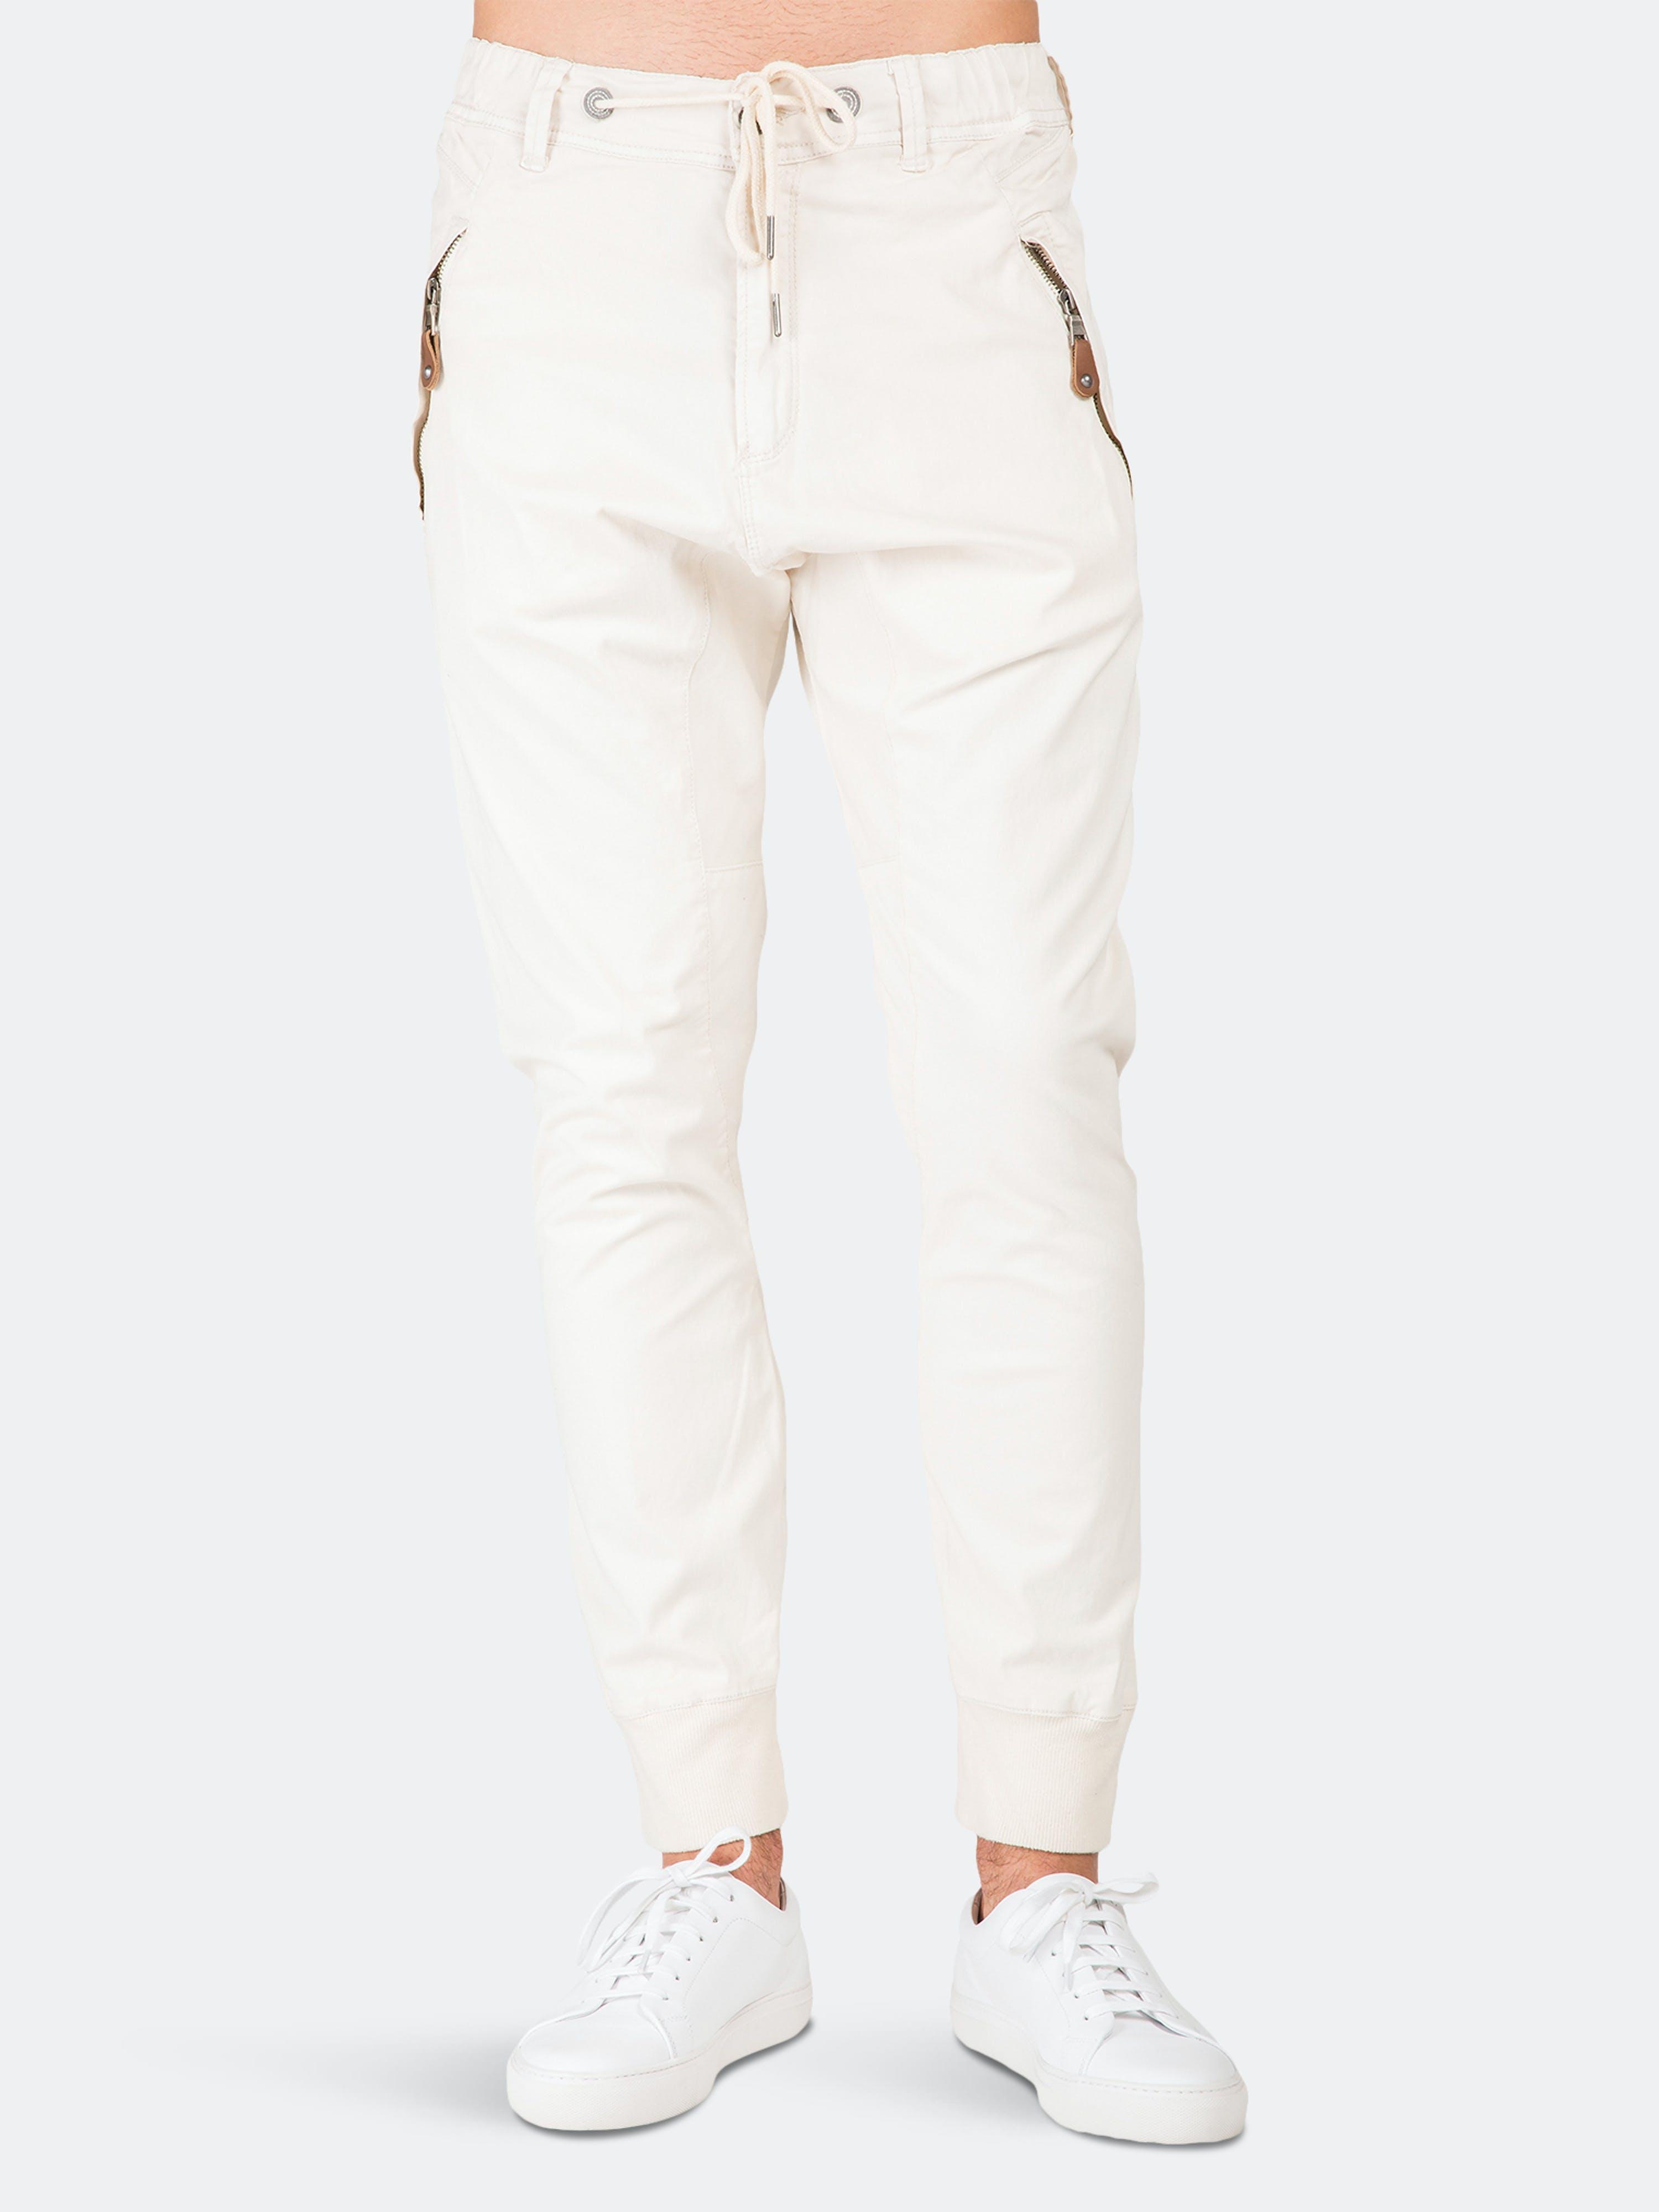 Level 7 Premium Stretch Twill Jogger Pant Drop Crotch Zipper Pockets In White